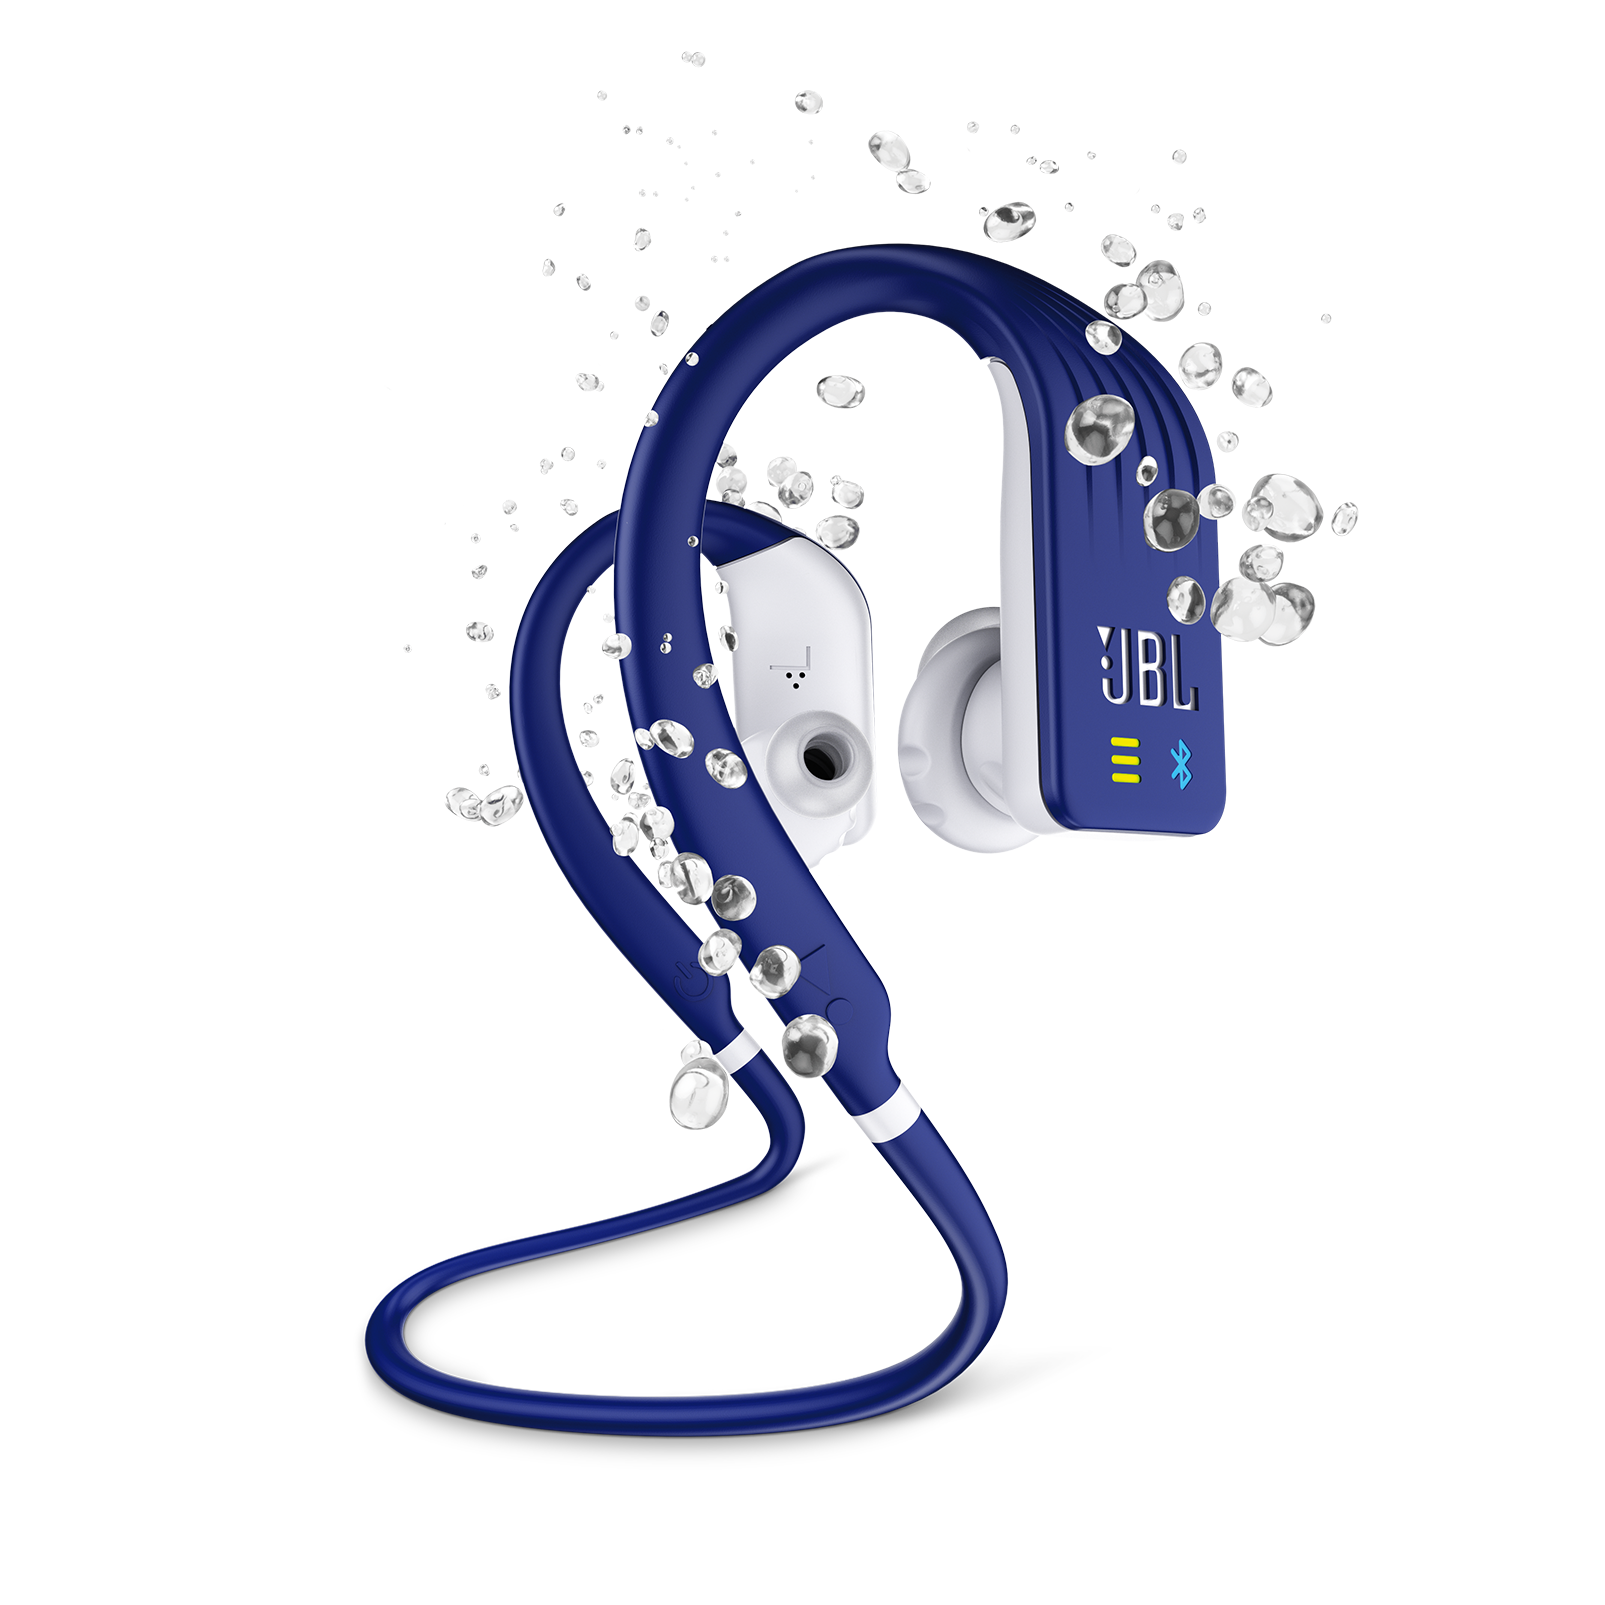 JBL Endurance DIVE - Blue - Waterproof Wireless In-Ear Sport Headphones with MP3 Player - Hero